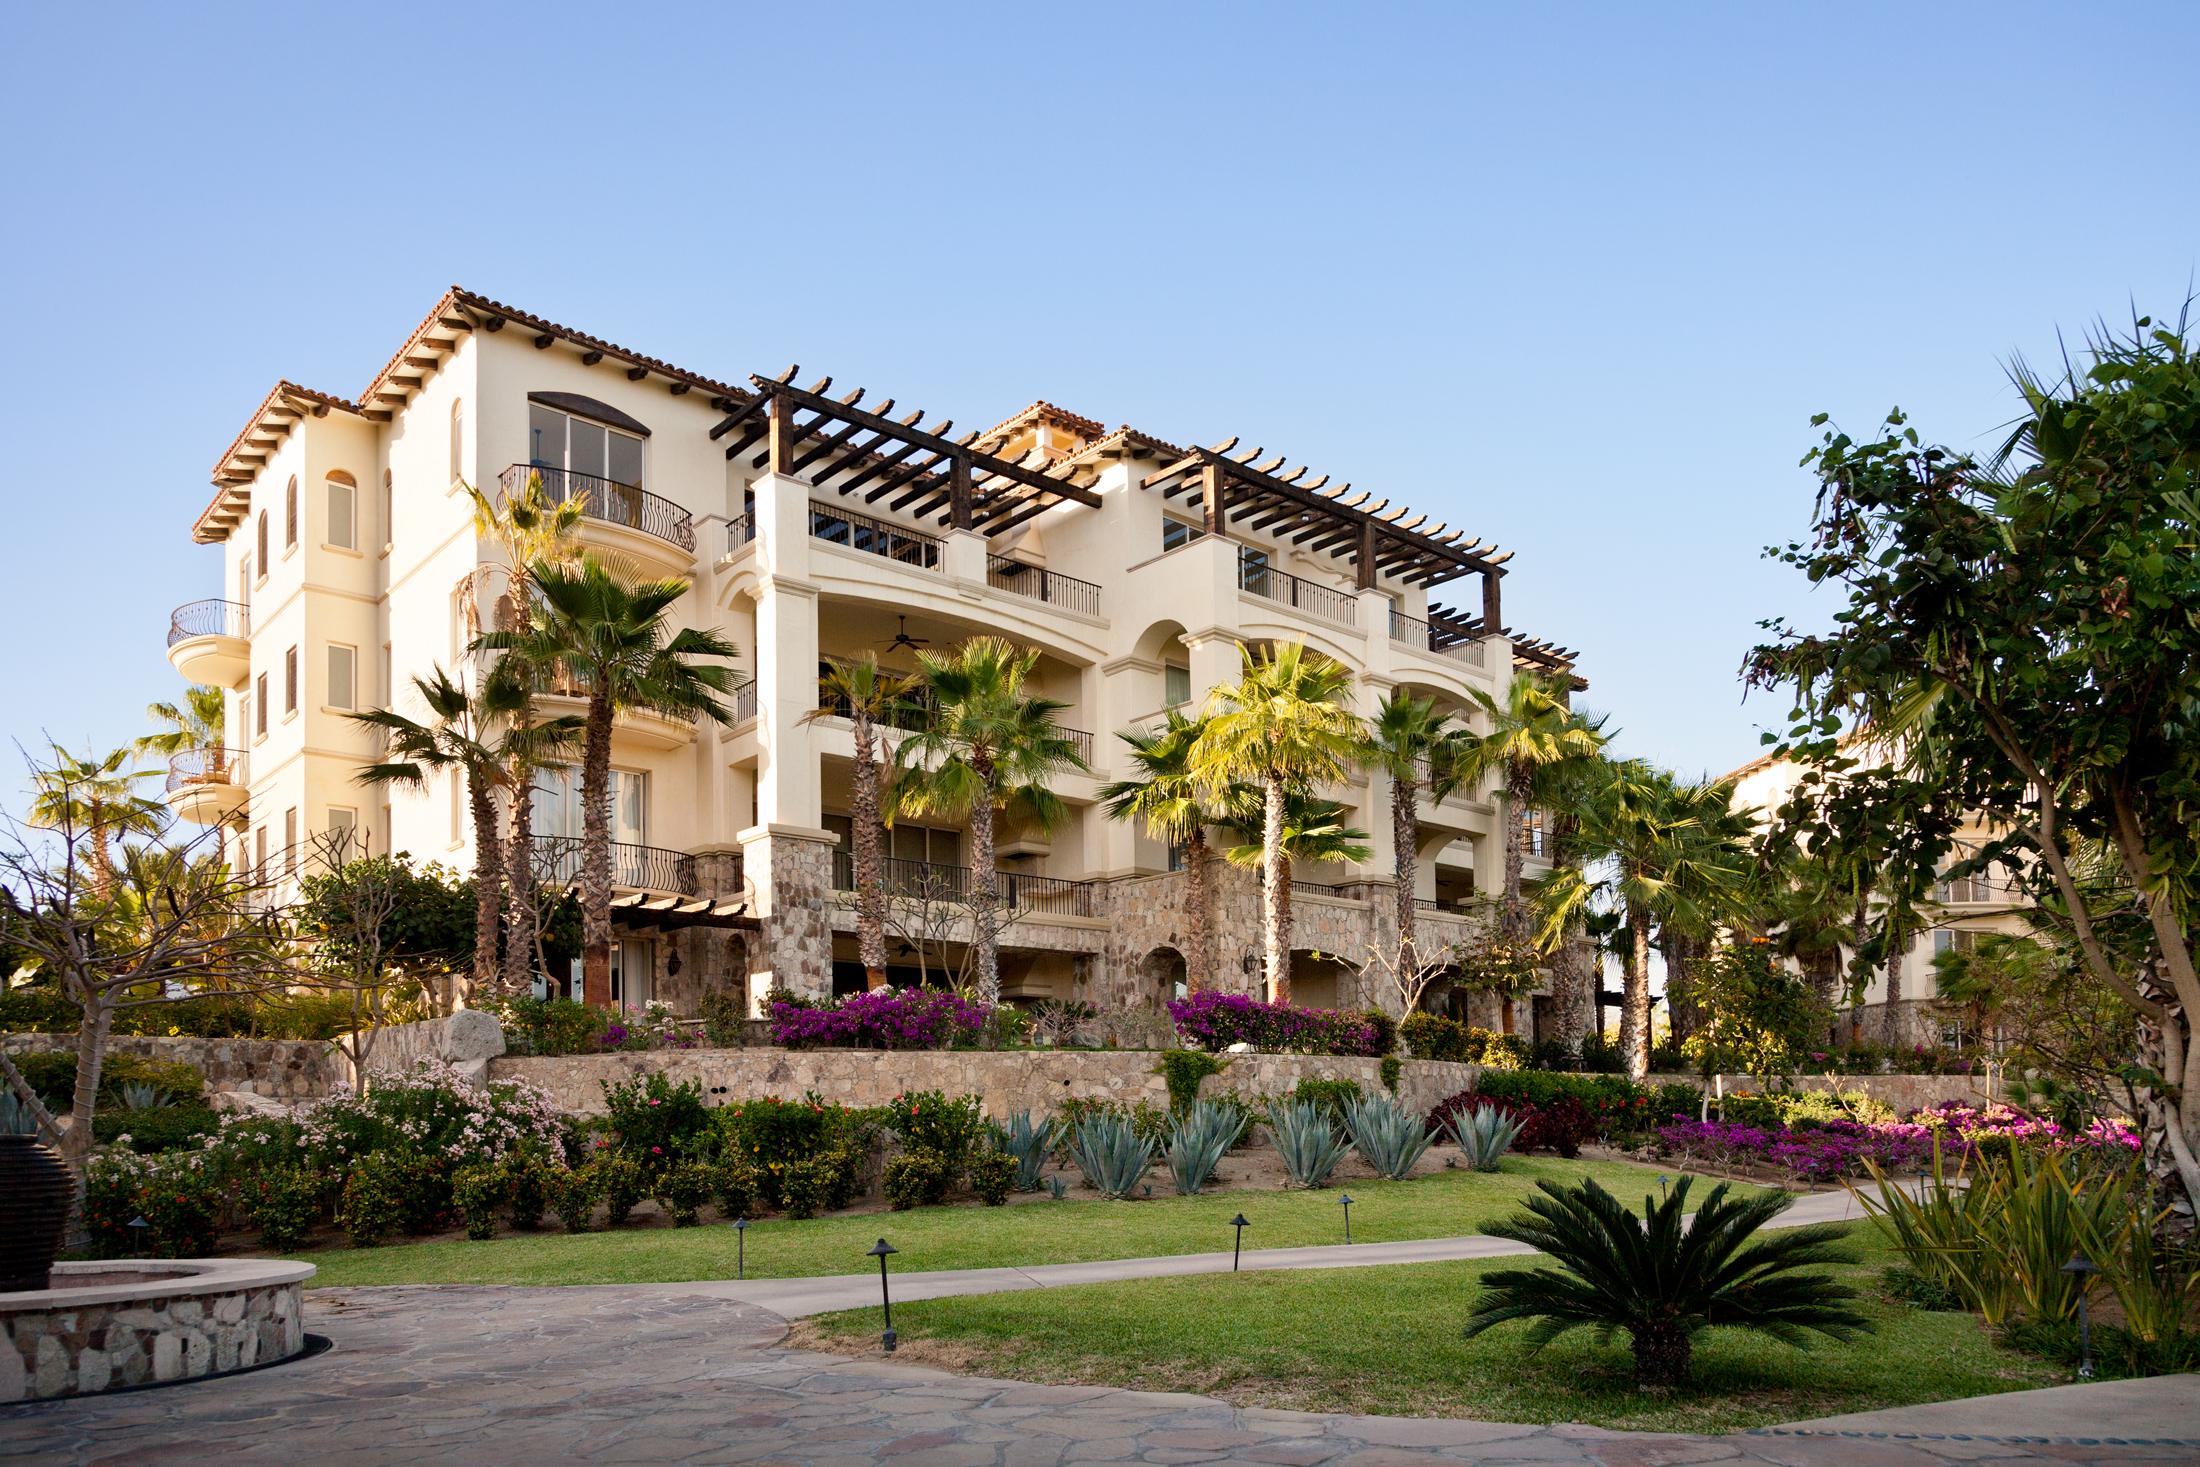 Esperanza Resort  Cabo San Lucas Mexico  HKS   Back to Portfolios